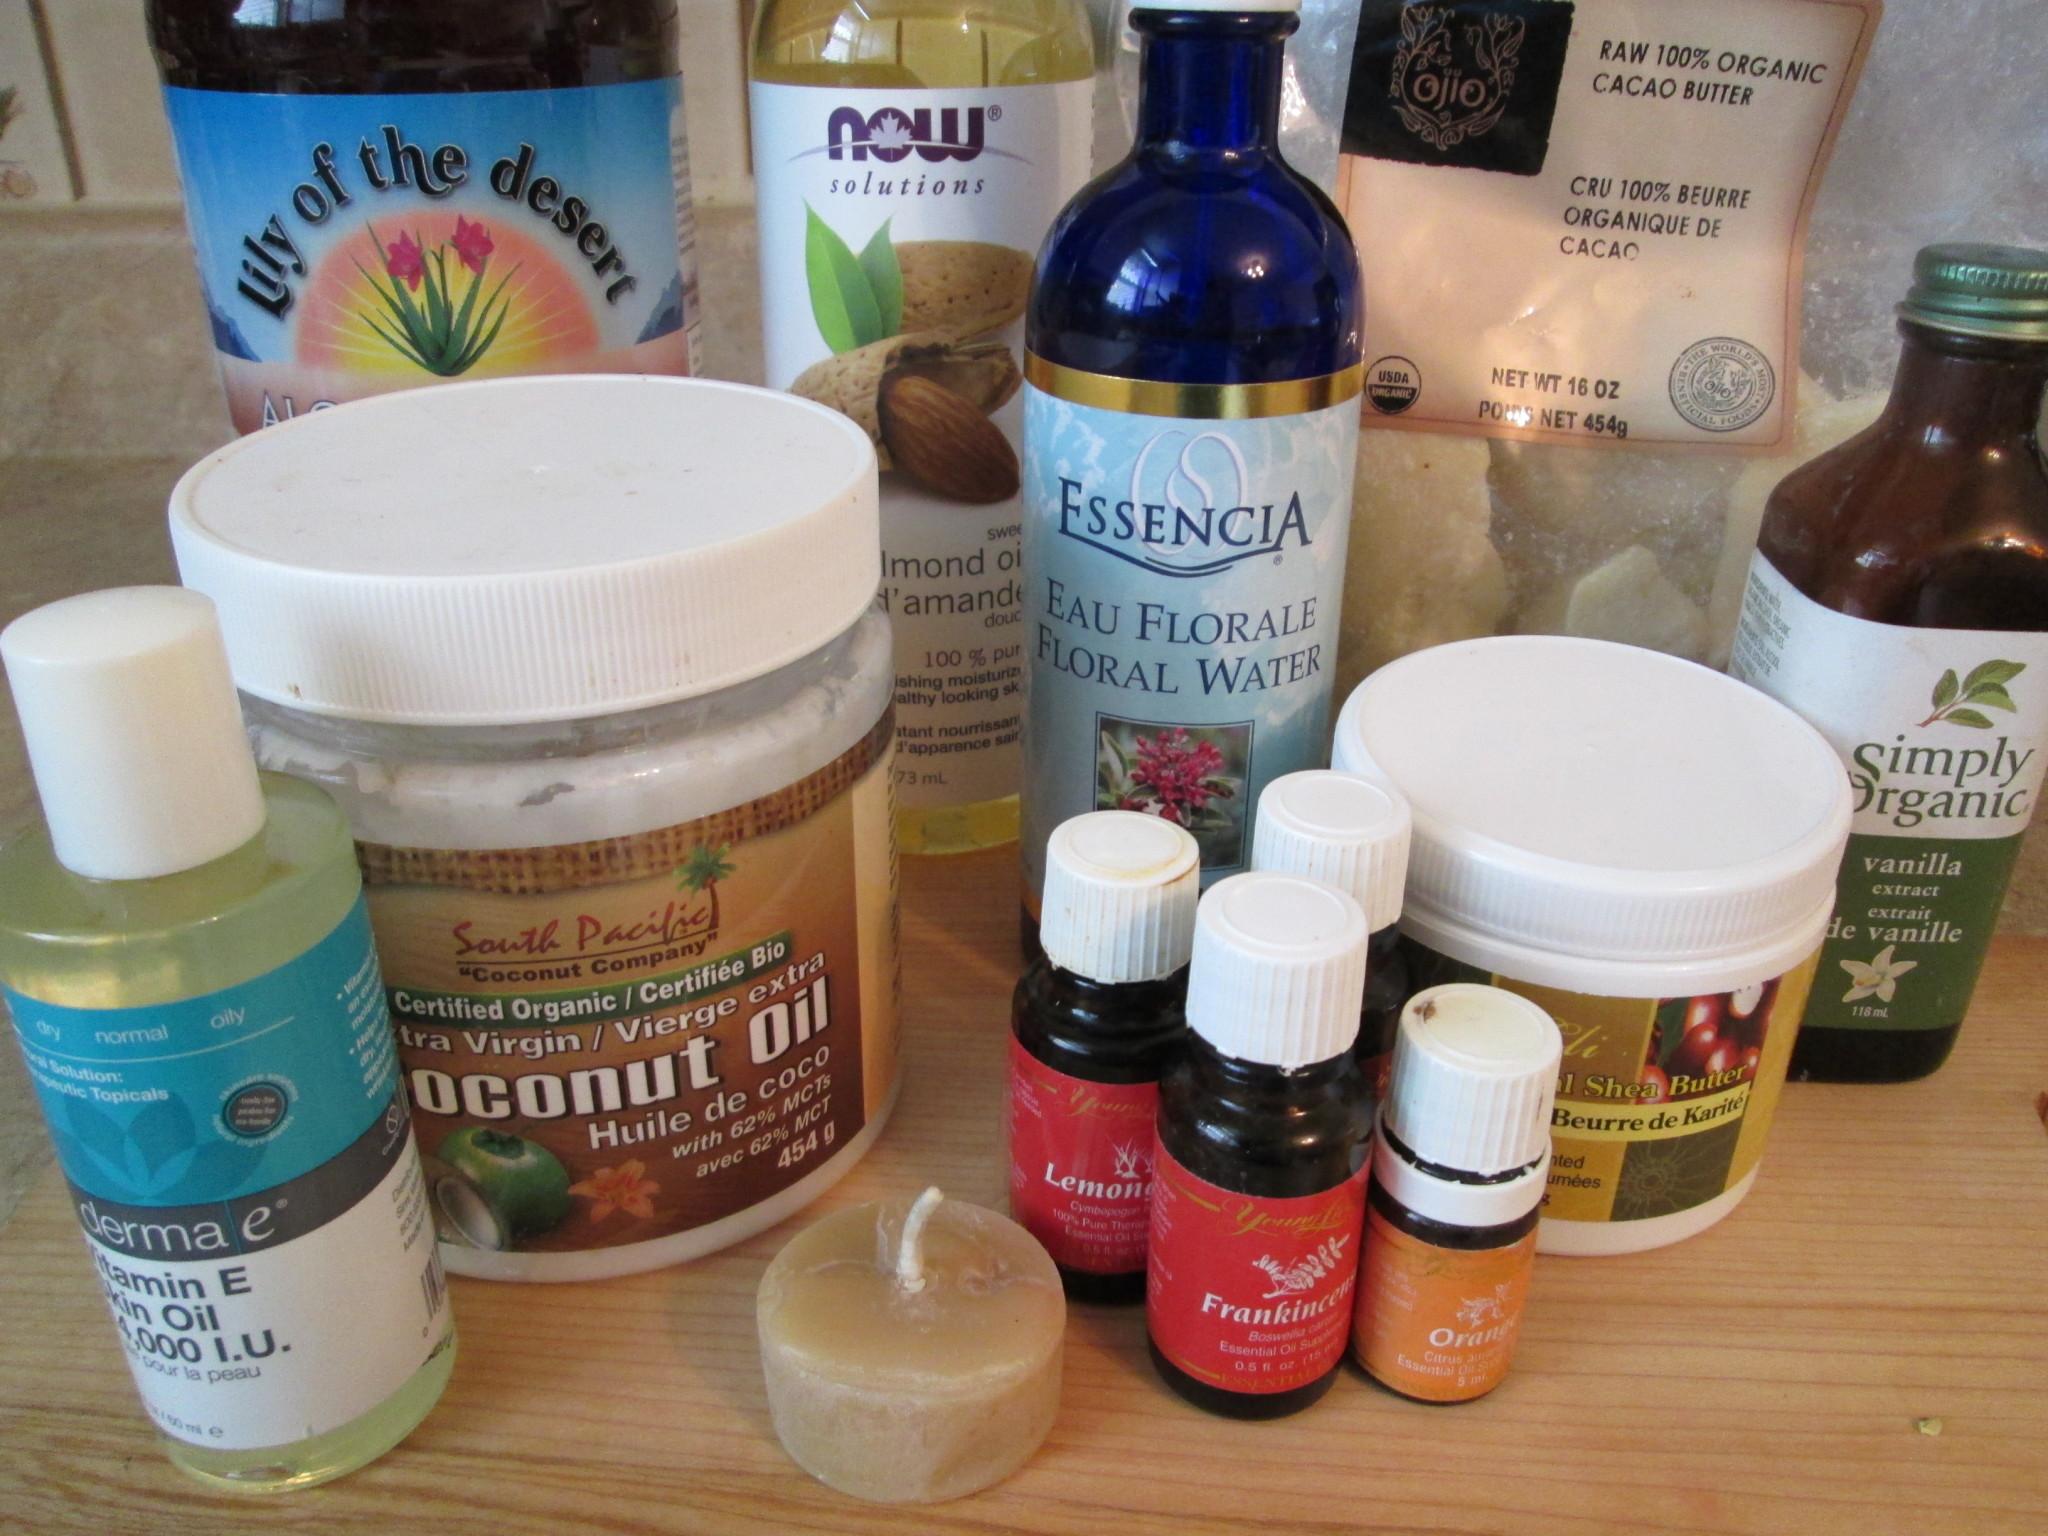 Anti Aging Night Cream Homemade diy beauty: luxurious homemade all natural face cream recipe